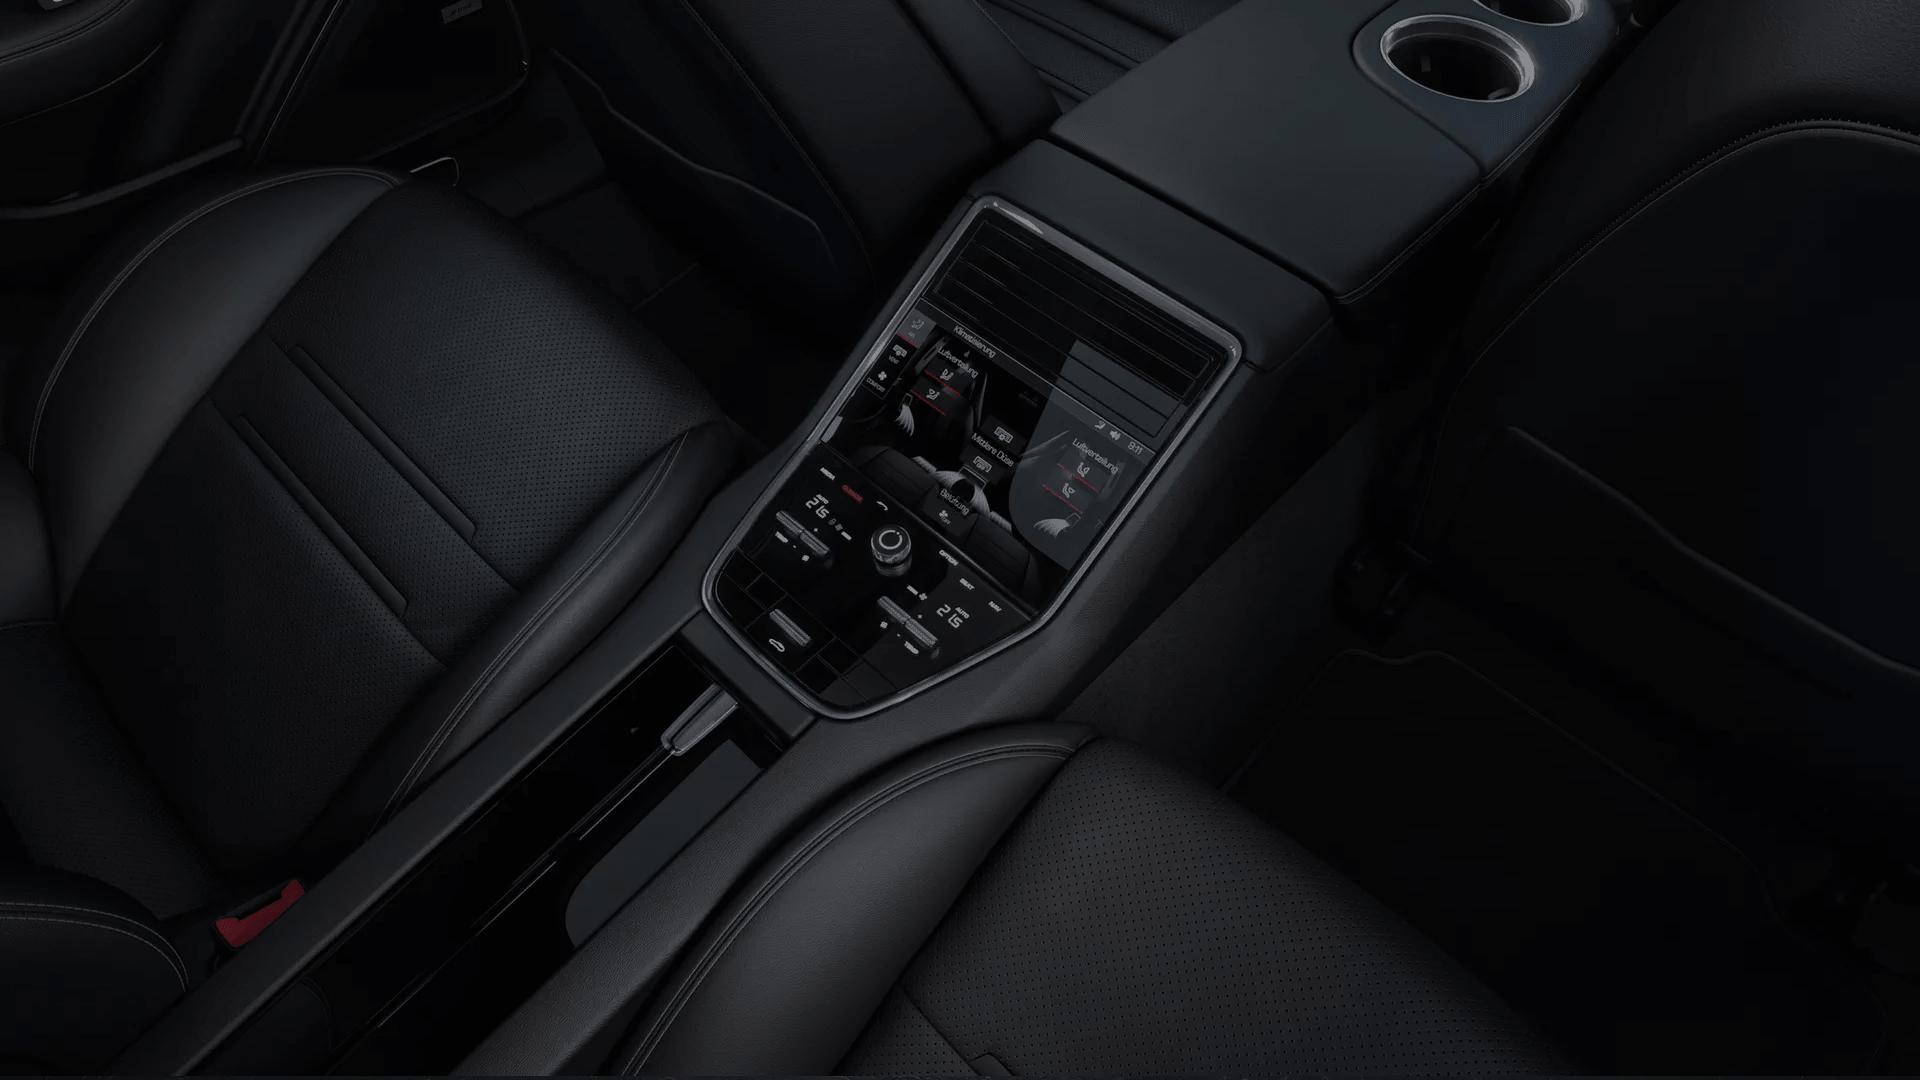 Panamera front seat interior